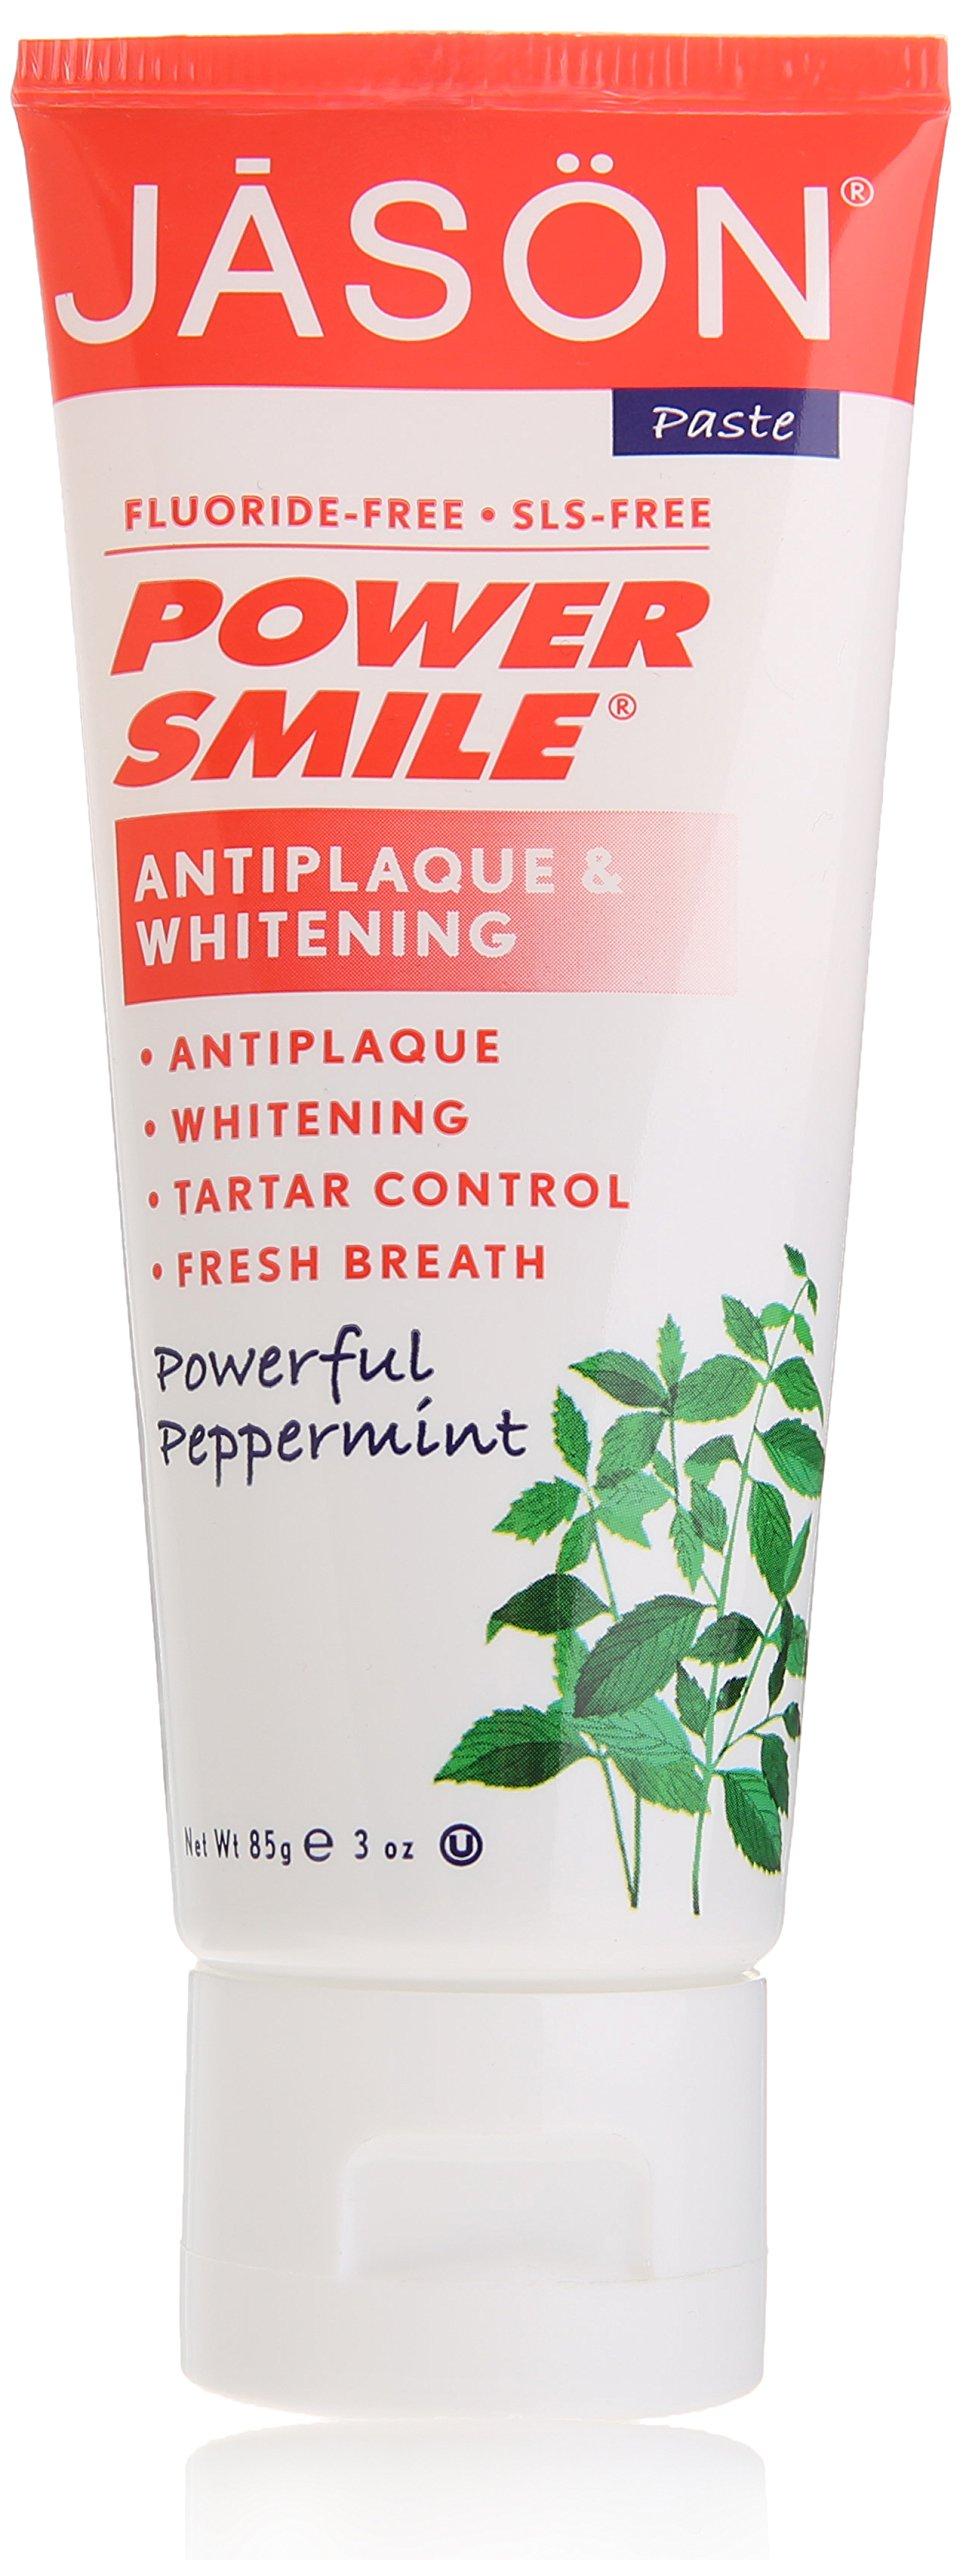 Jason Powersmile Travel Size Toothpaste, Peppermint, 3 Ounce